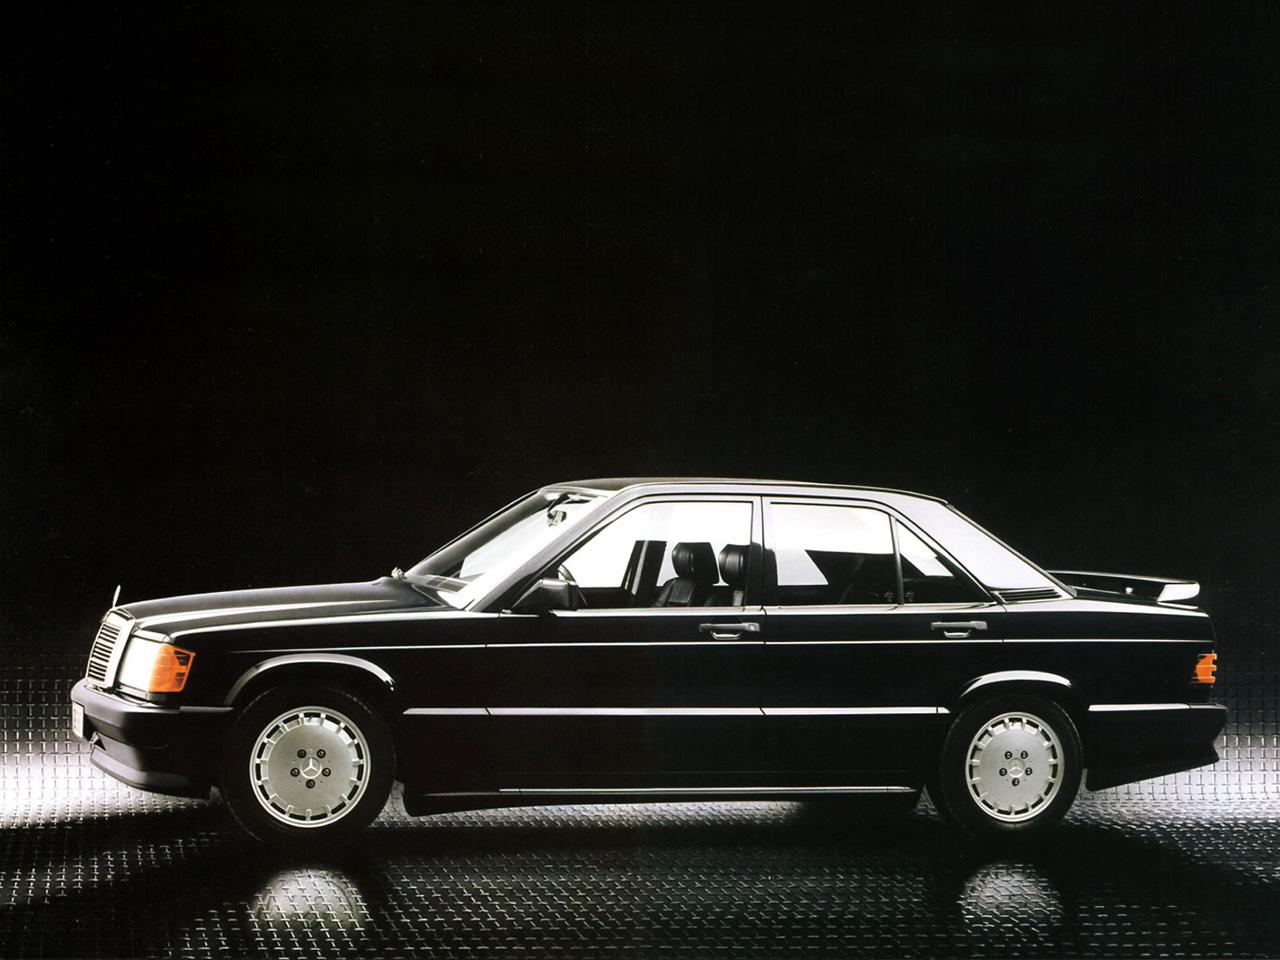 Mercedes 190 E 2.3-16 (2)